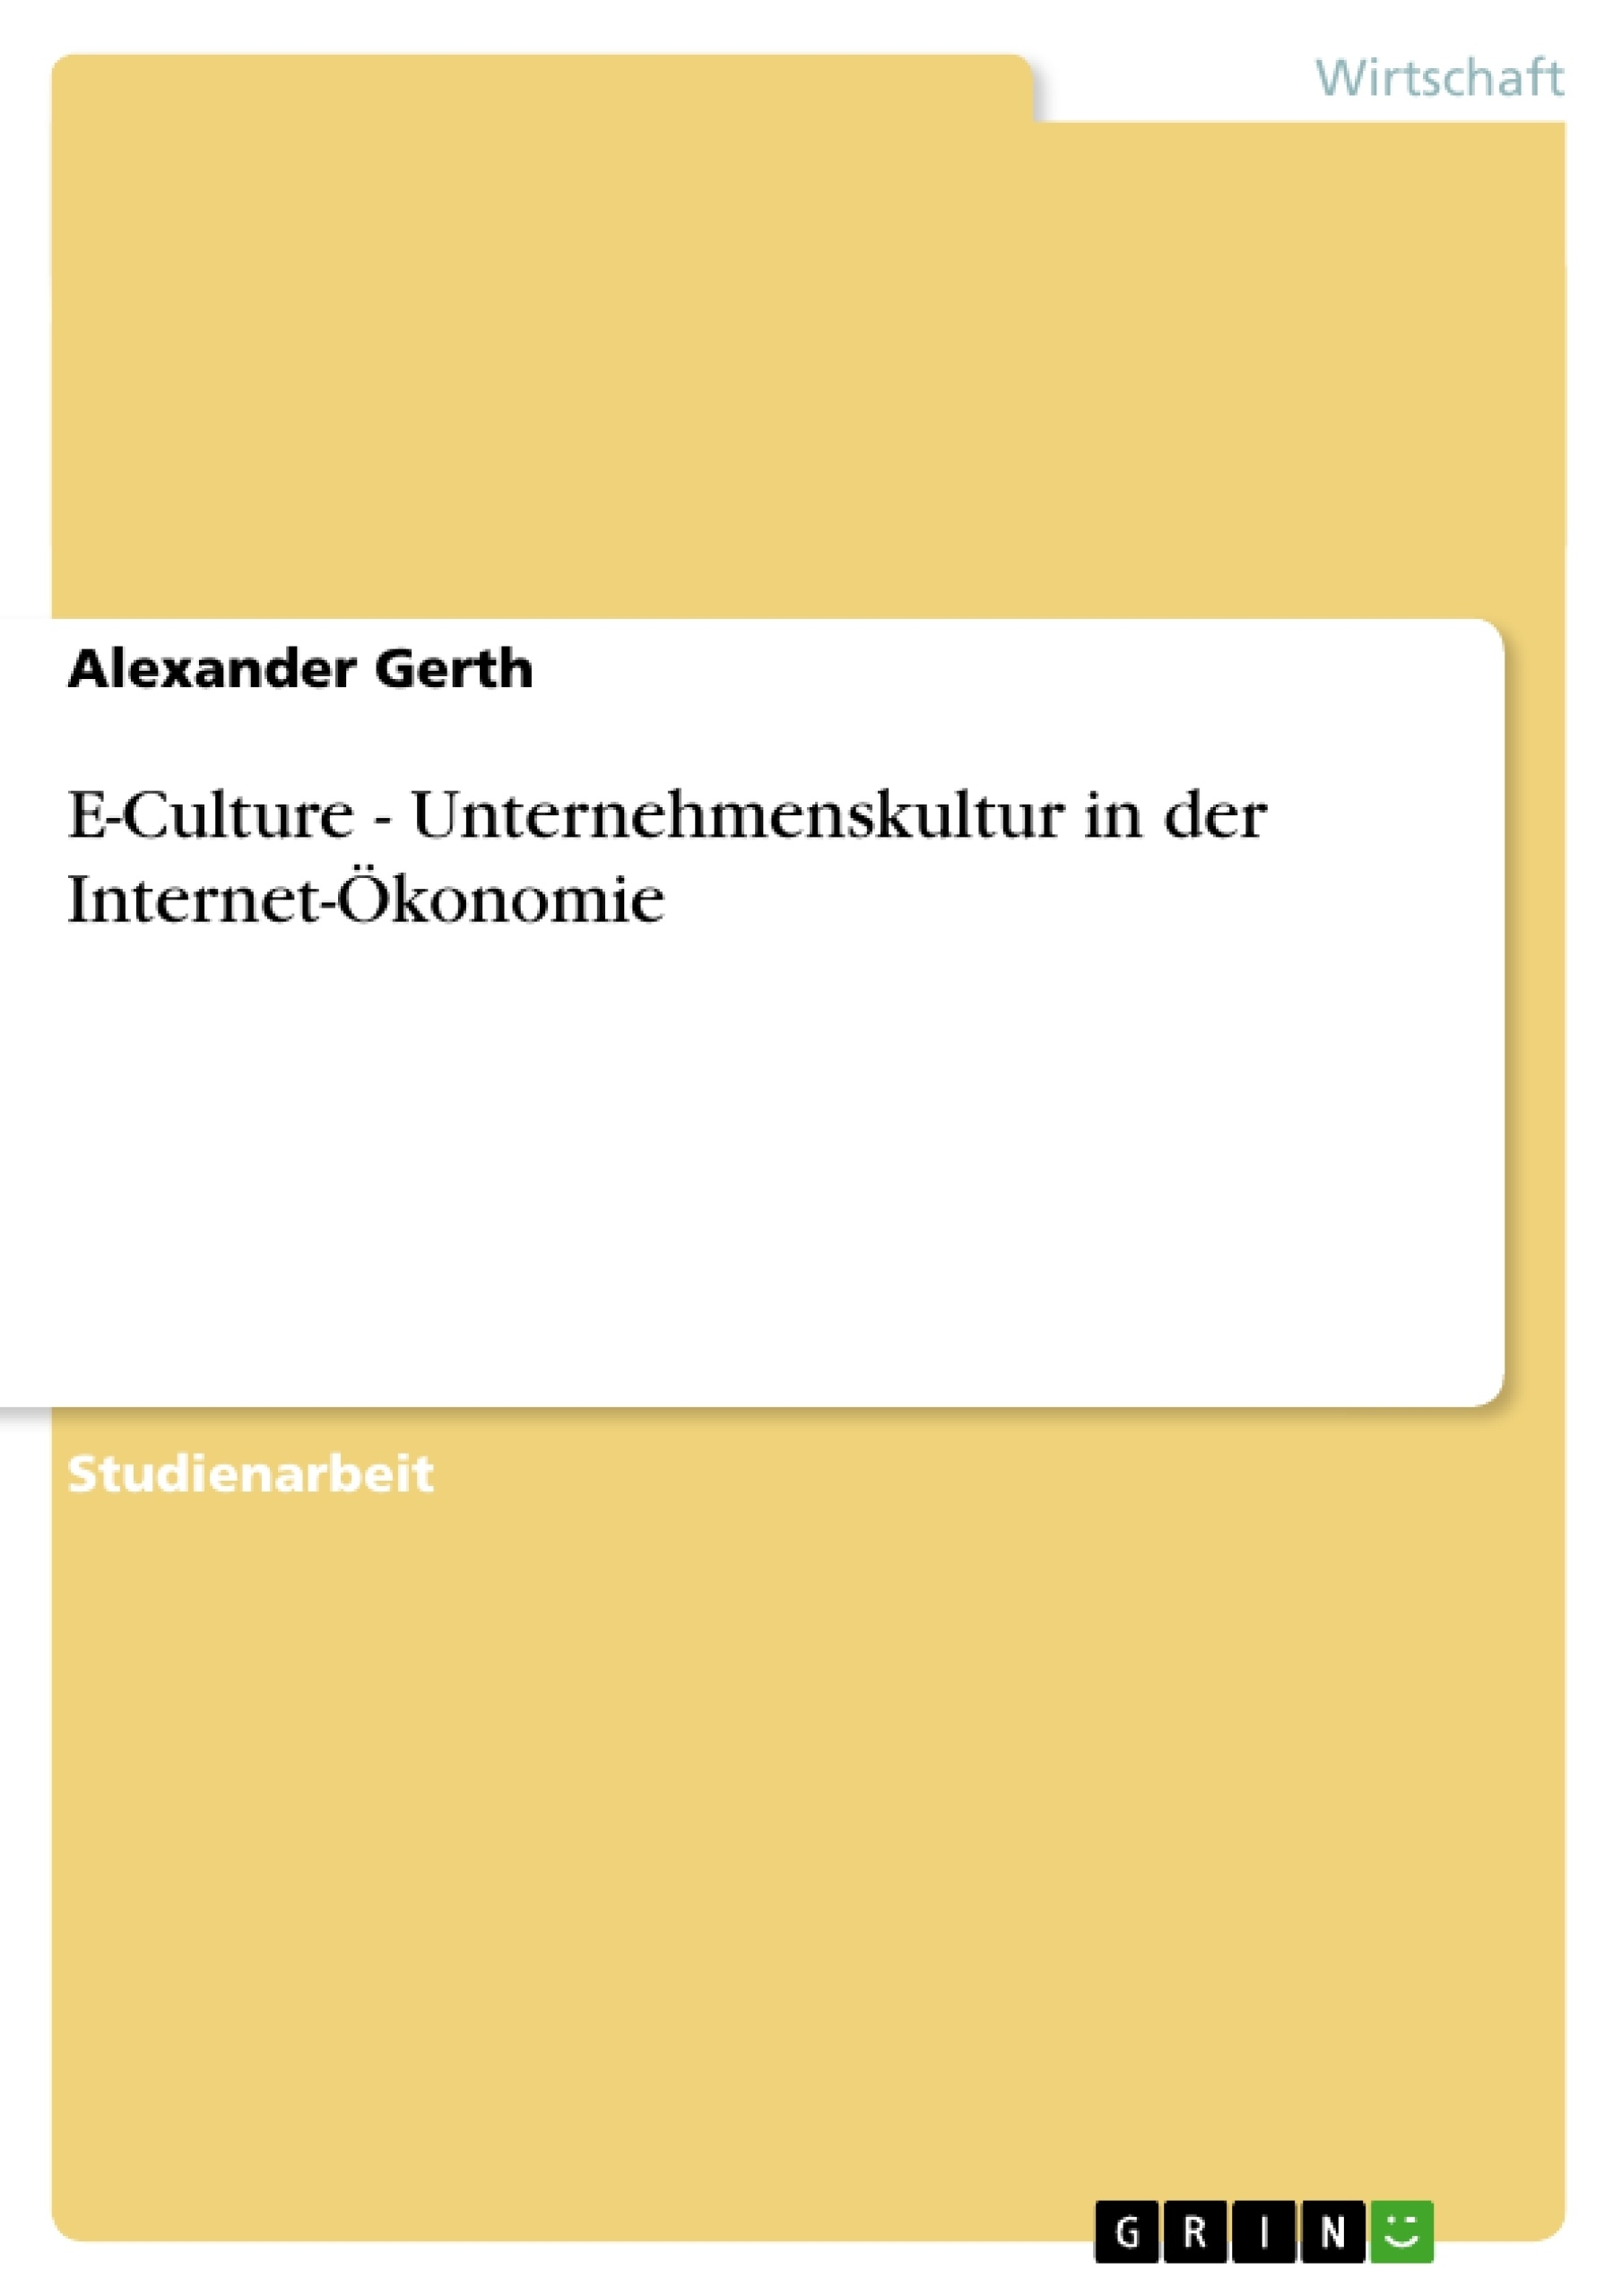 Titel: E-Culture - Unternehmenskultur in der Internet-Ökonomie